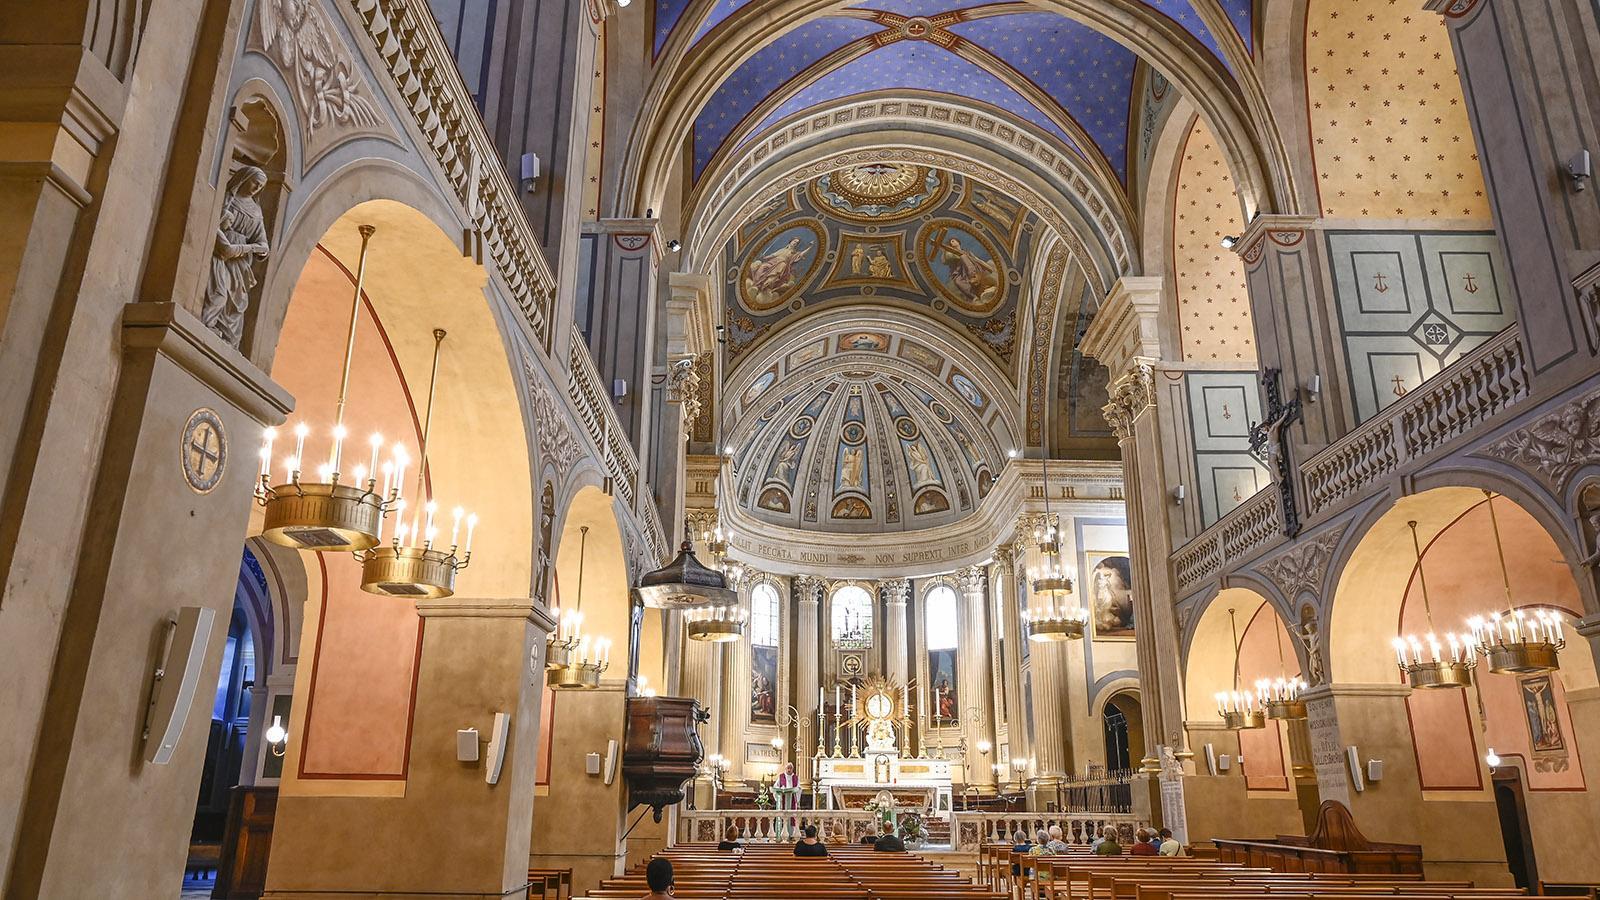 Alès: Im Innern der Cathédrale Saint-Jean-Baptiste. Foto: Hilke Maunder